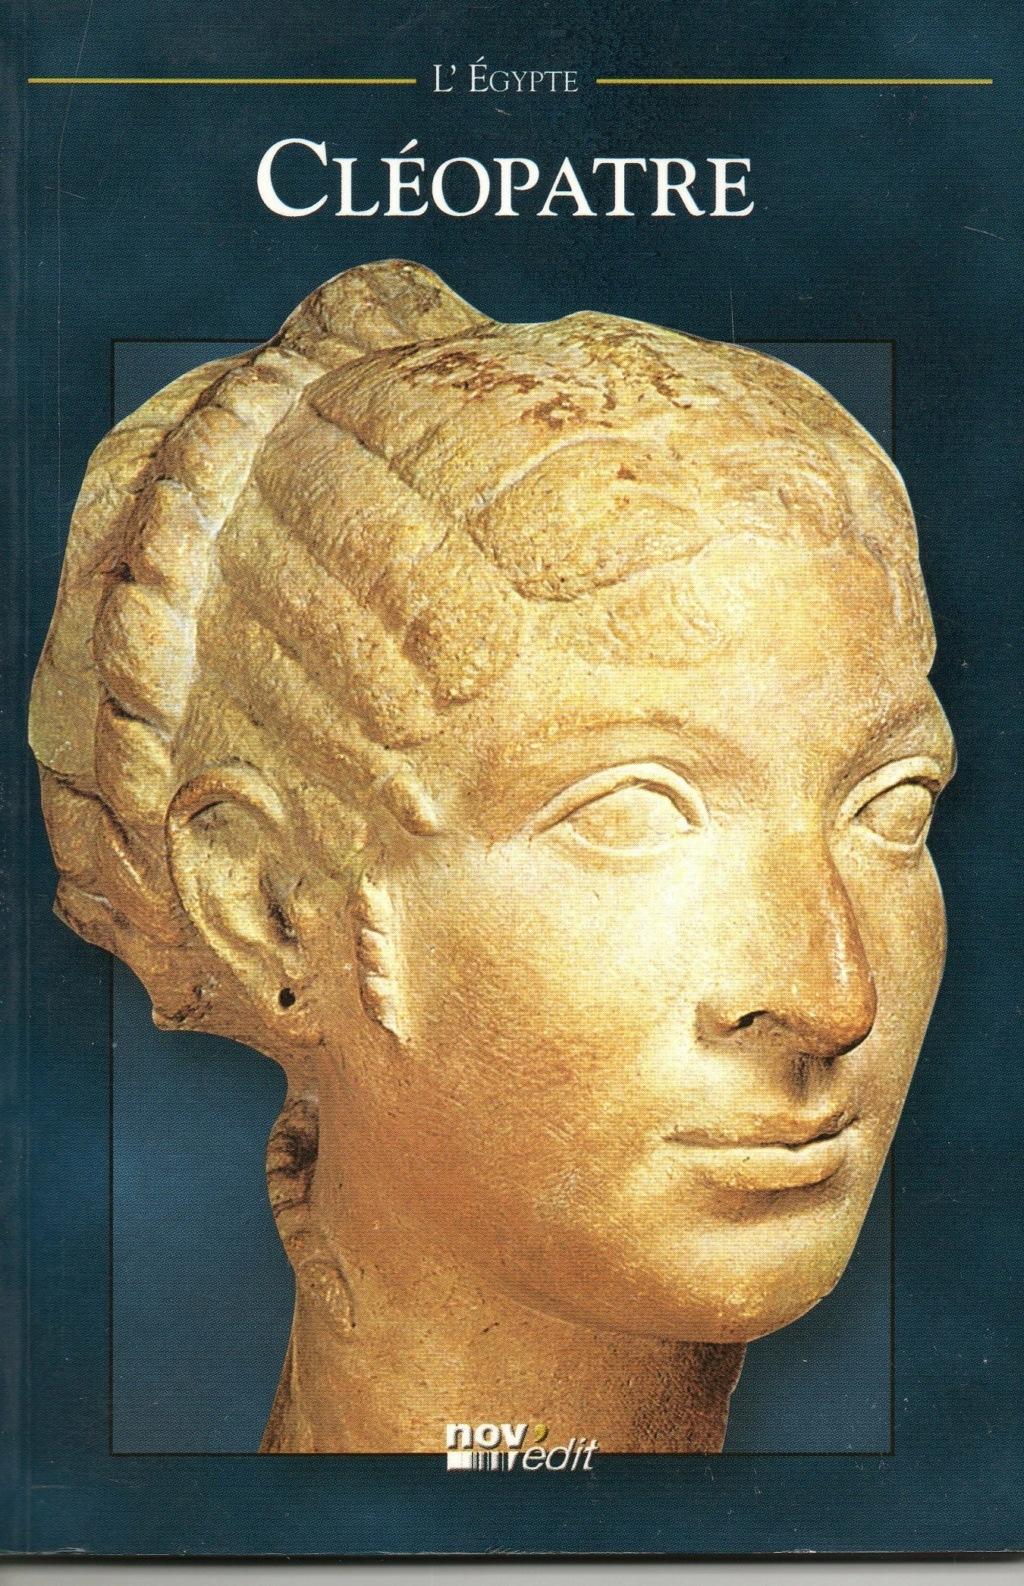 Cléopâtre, reine d'Egypte - Page 4 A1gmye10